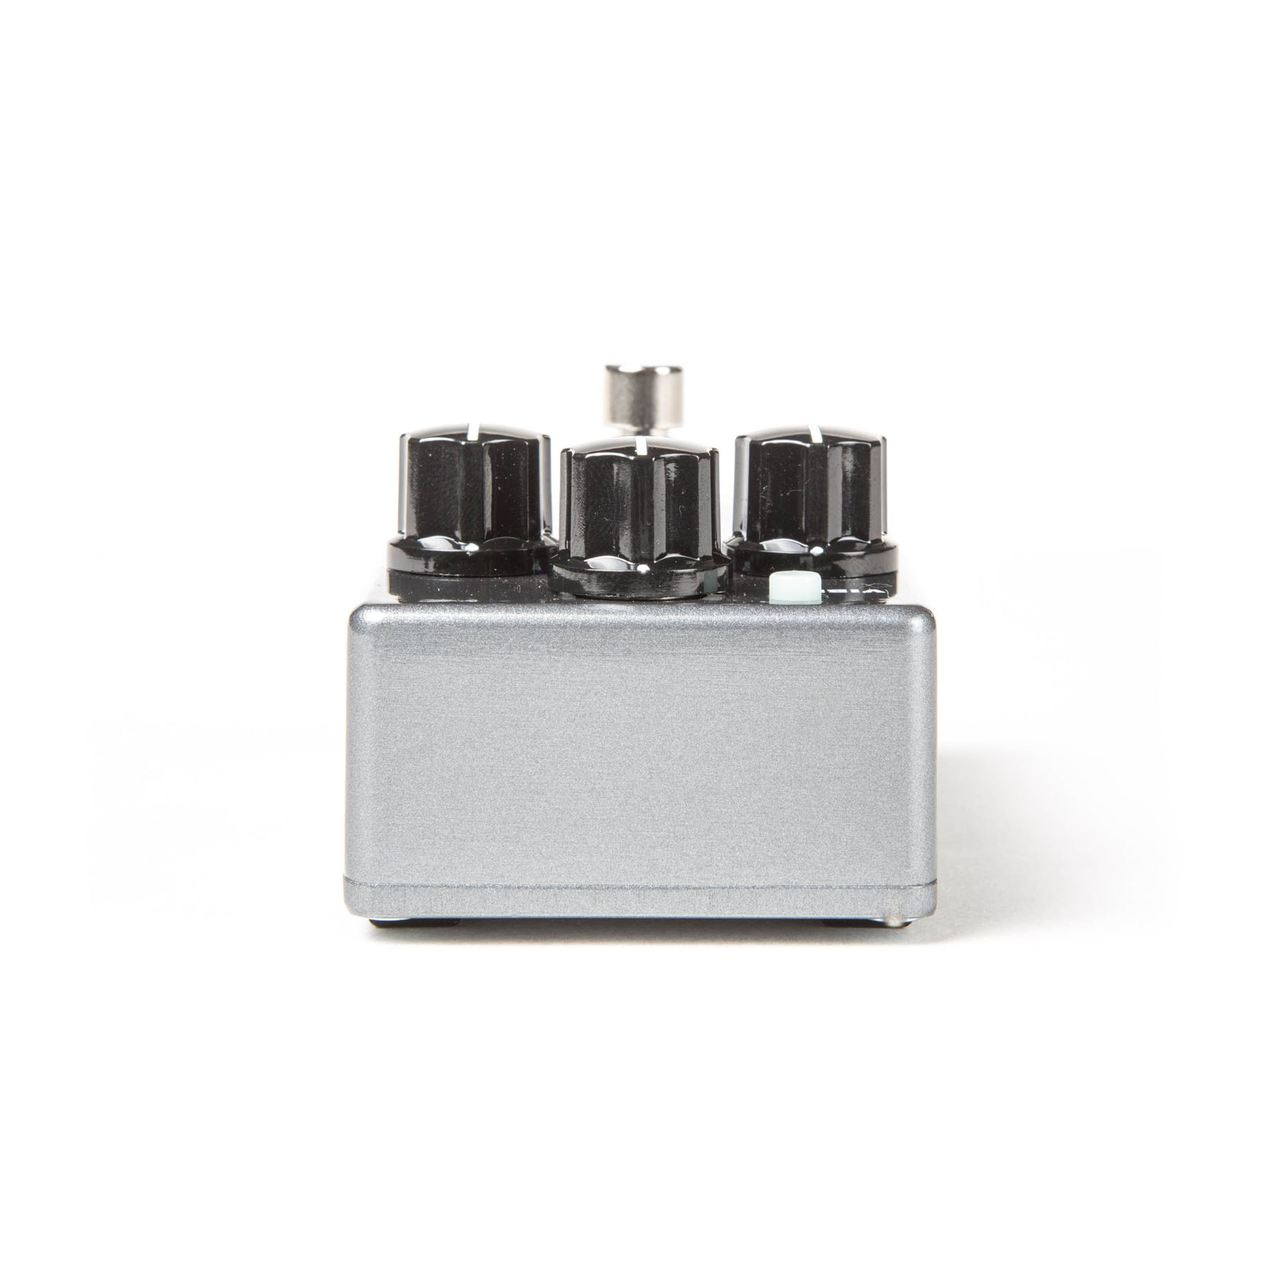 Dunlop JHM7 Limited Edition Jimi Hendrix Uni-Vibe pedal